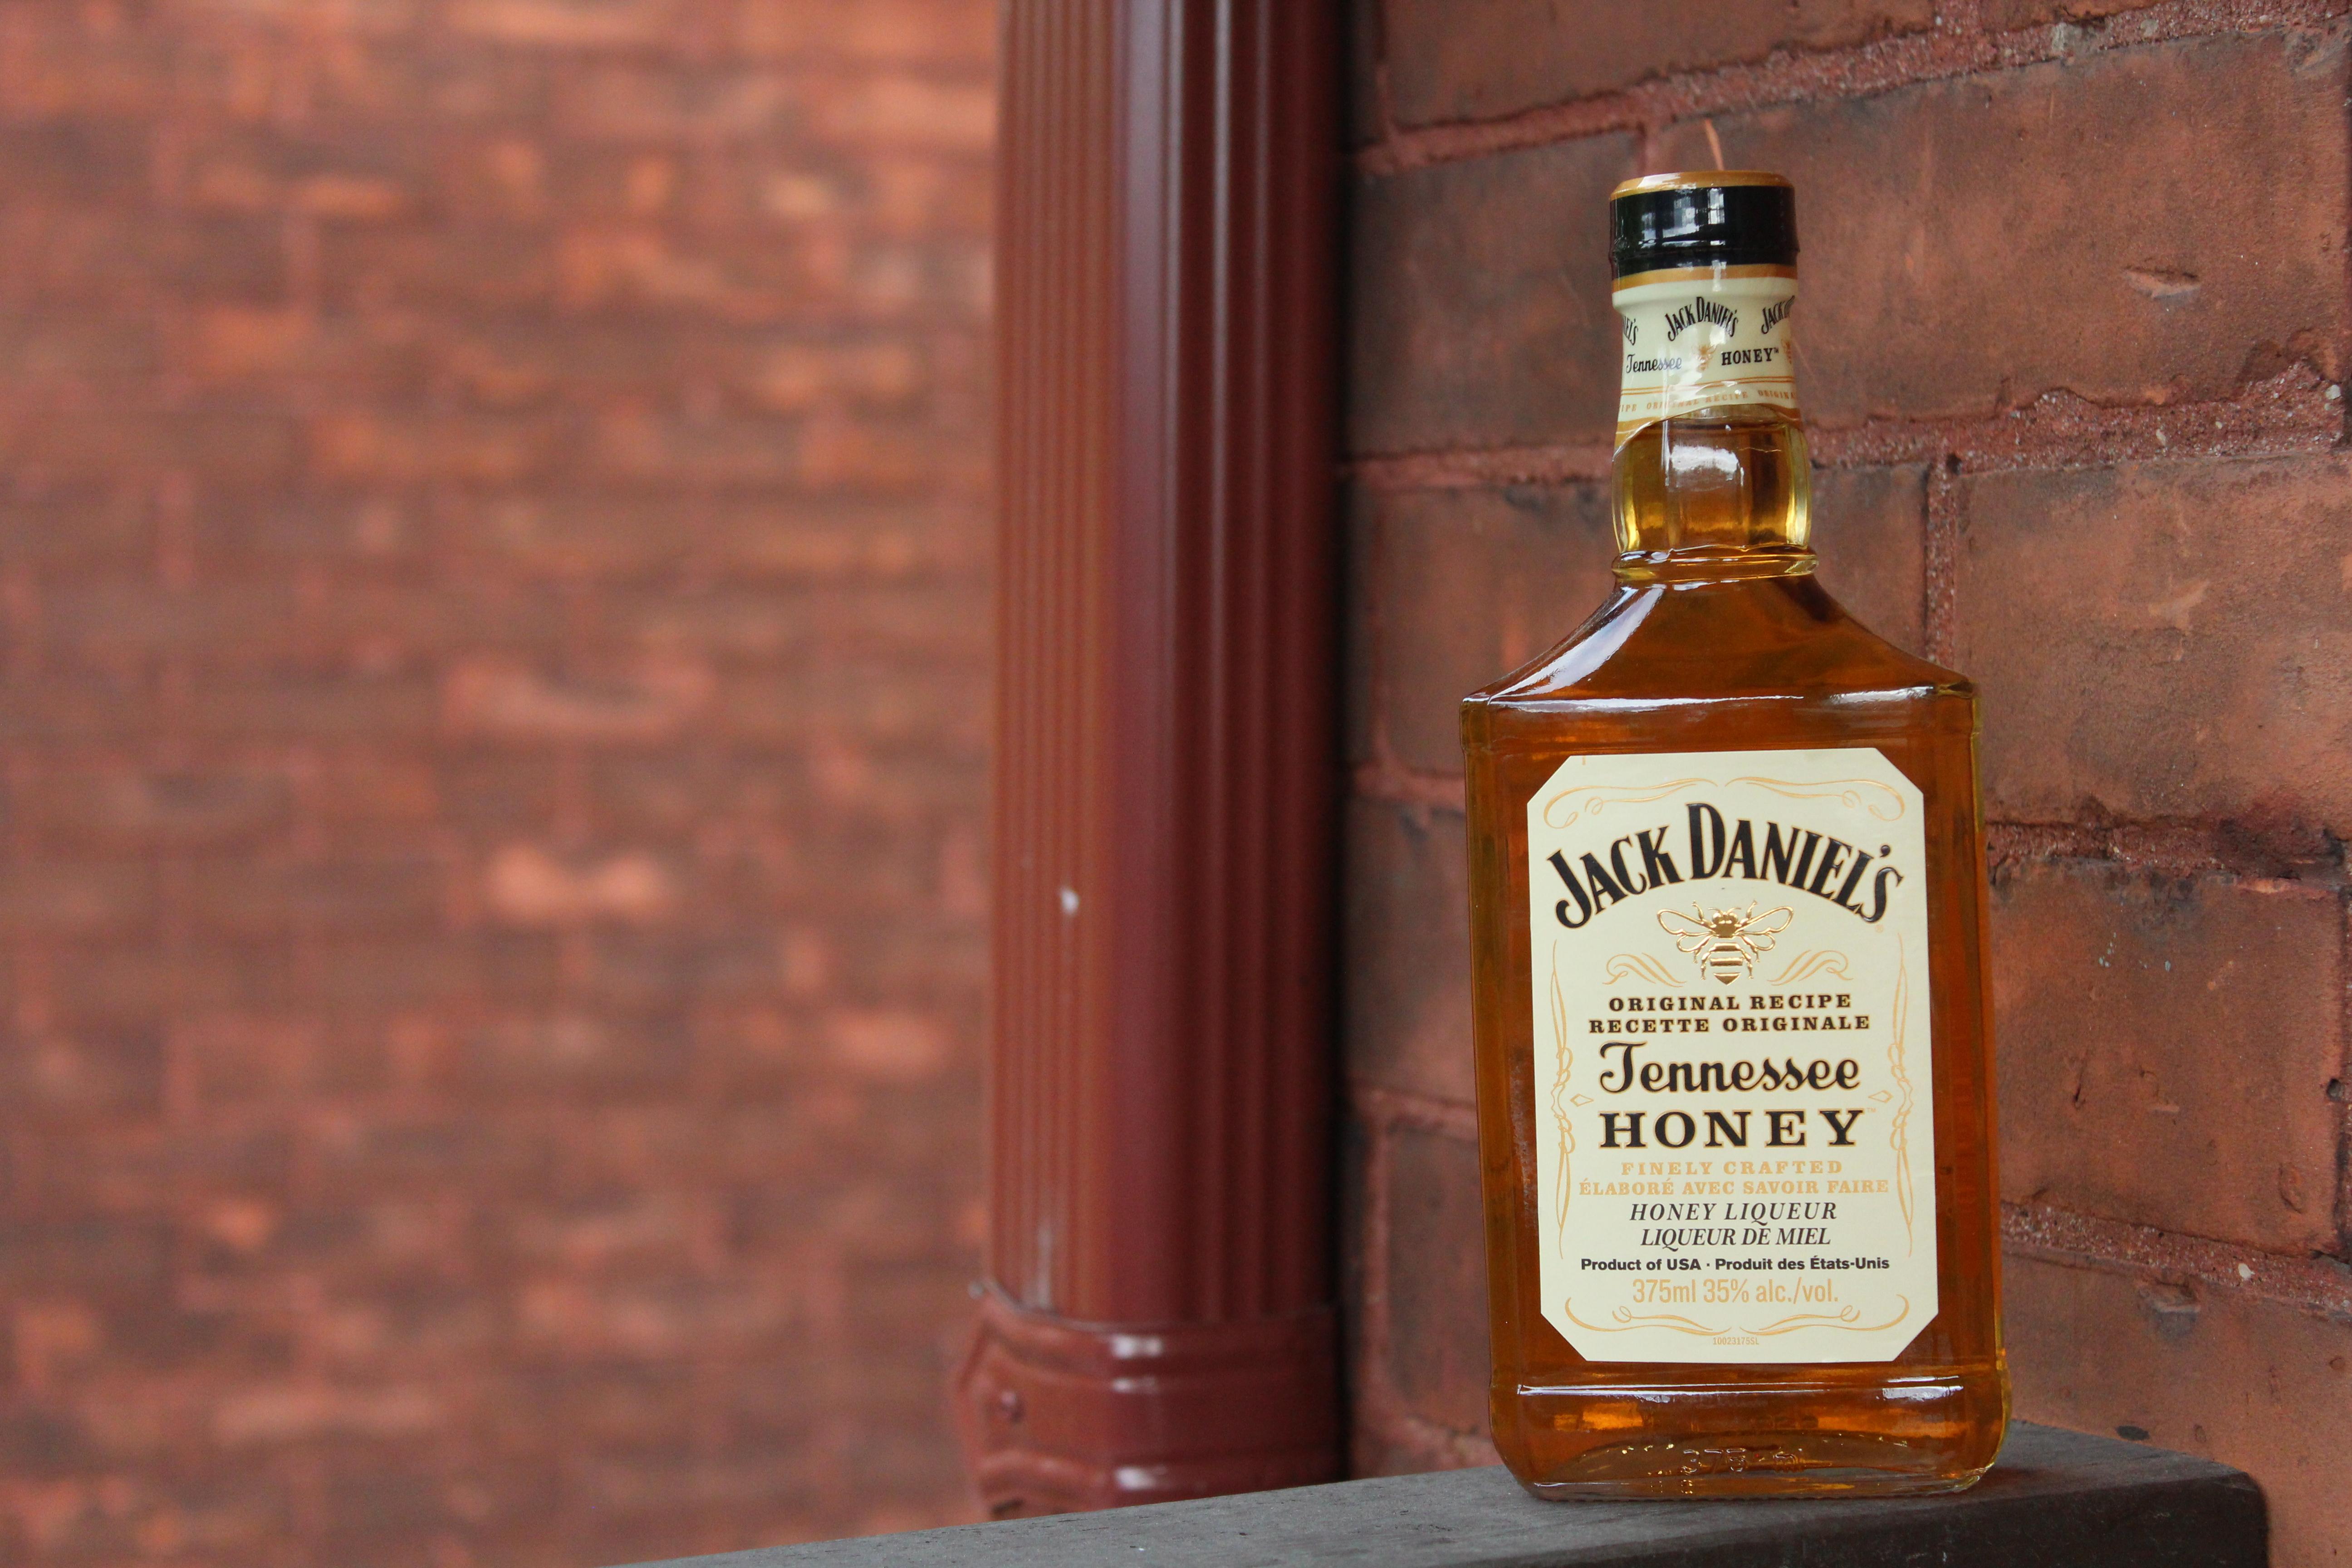 Jack Daniel's Tennessee Honey with Dan, Goran & Davey